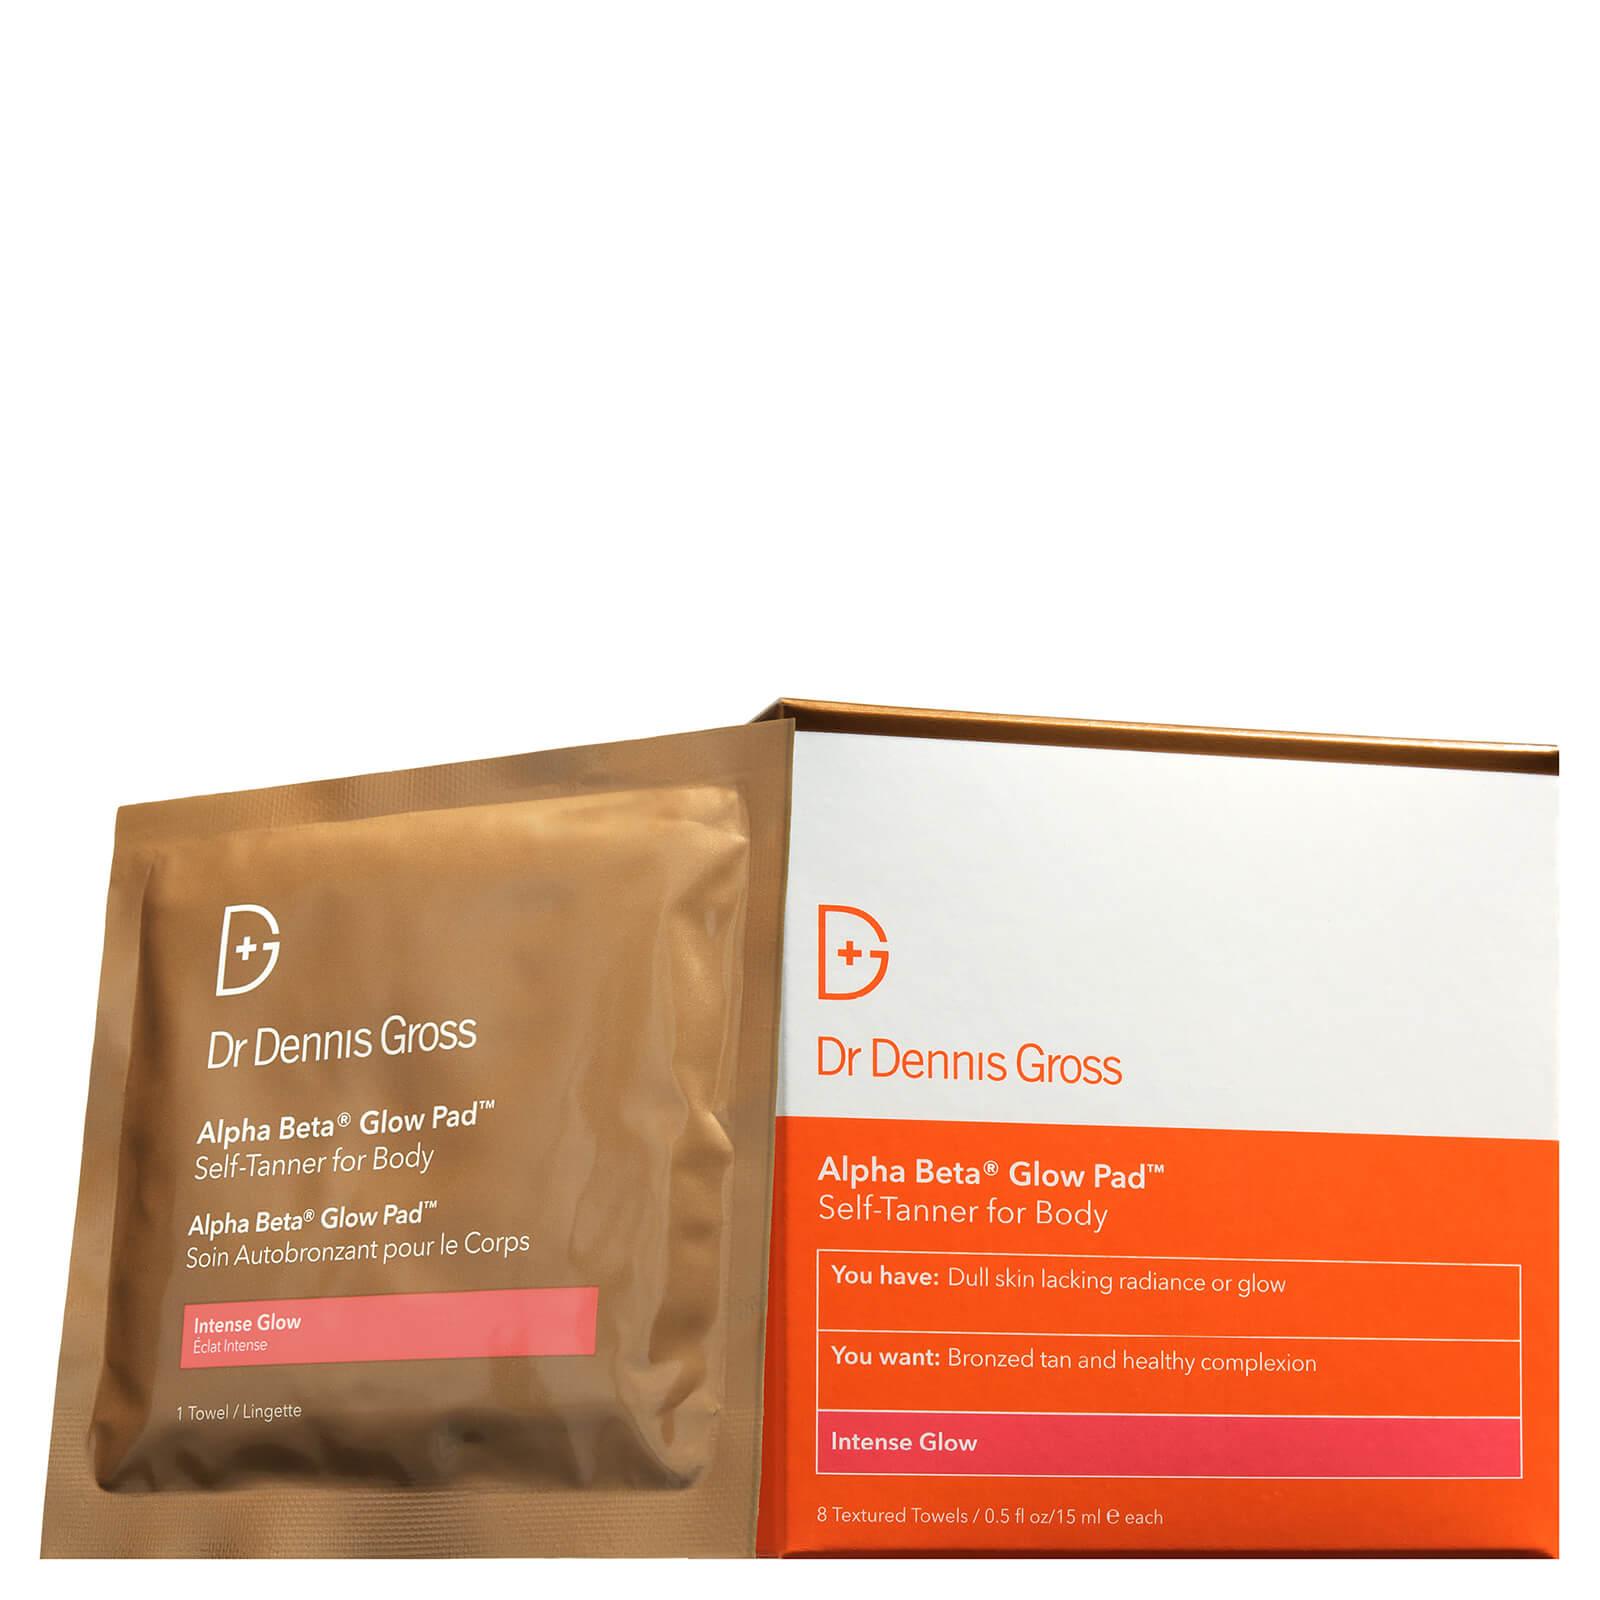 Dr Dennis Gross >> Dr Dennis Gross Alpha Beta Glow Pad For Body Skinstore